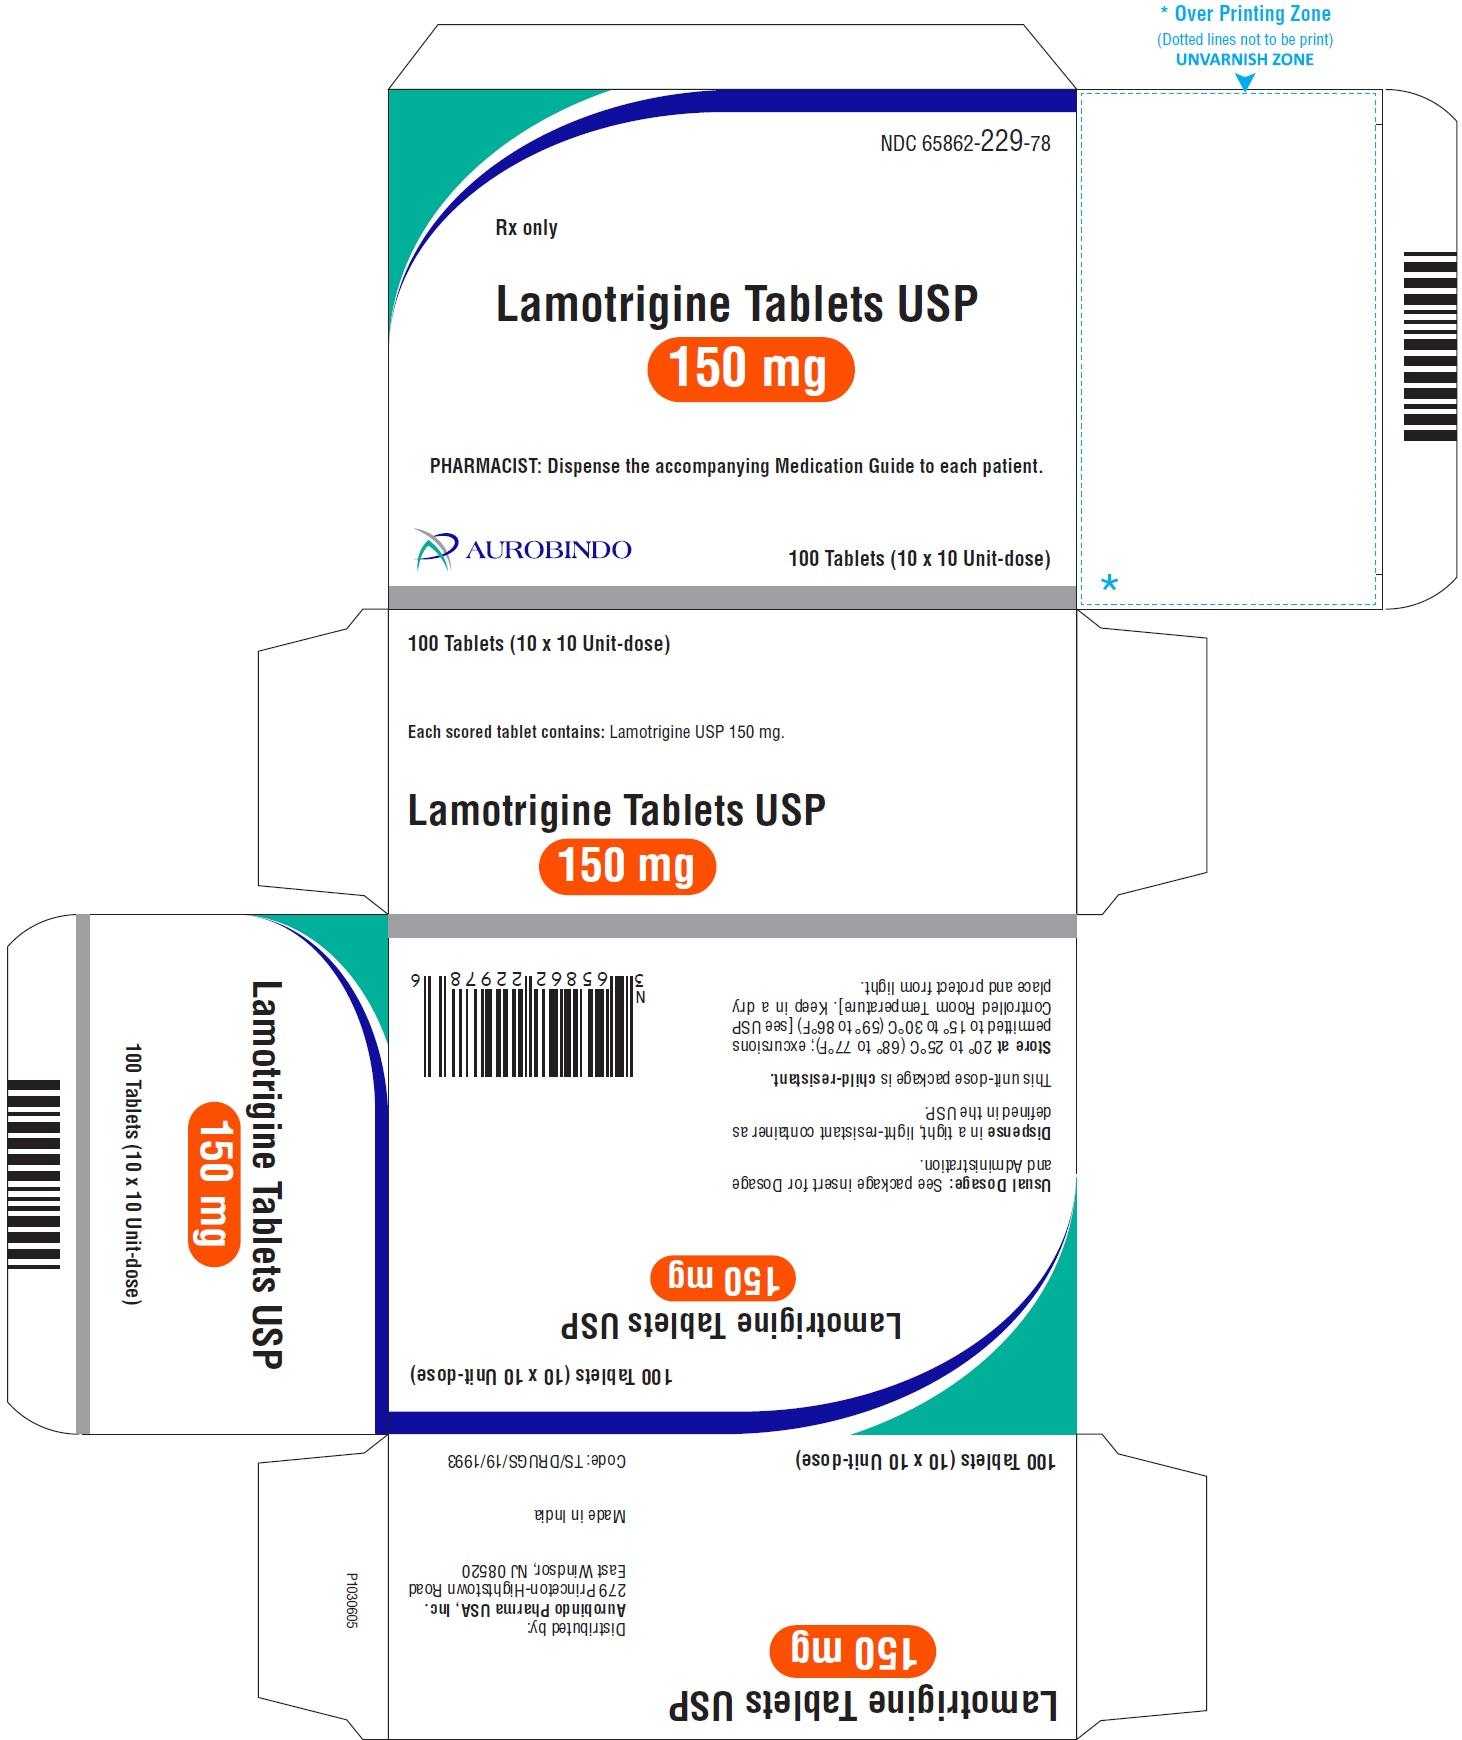 PACKAGE LABEL-PRINCIPAL DISPLAY PANEL - 150 mg Blister Carton (10 x 10 Unit-dose)